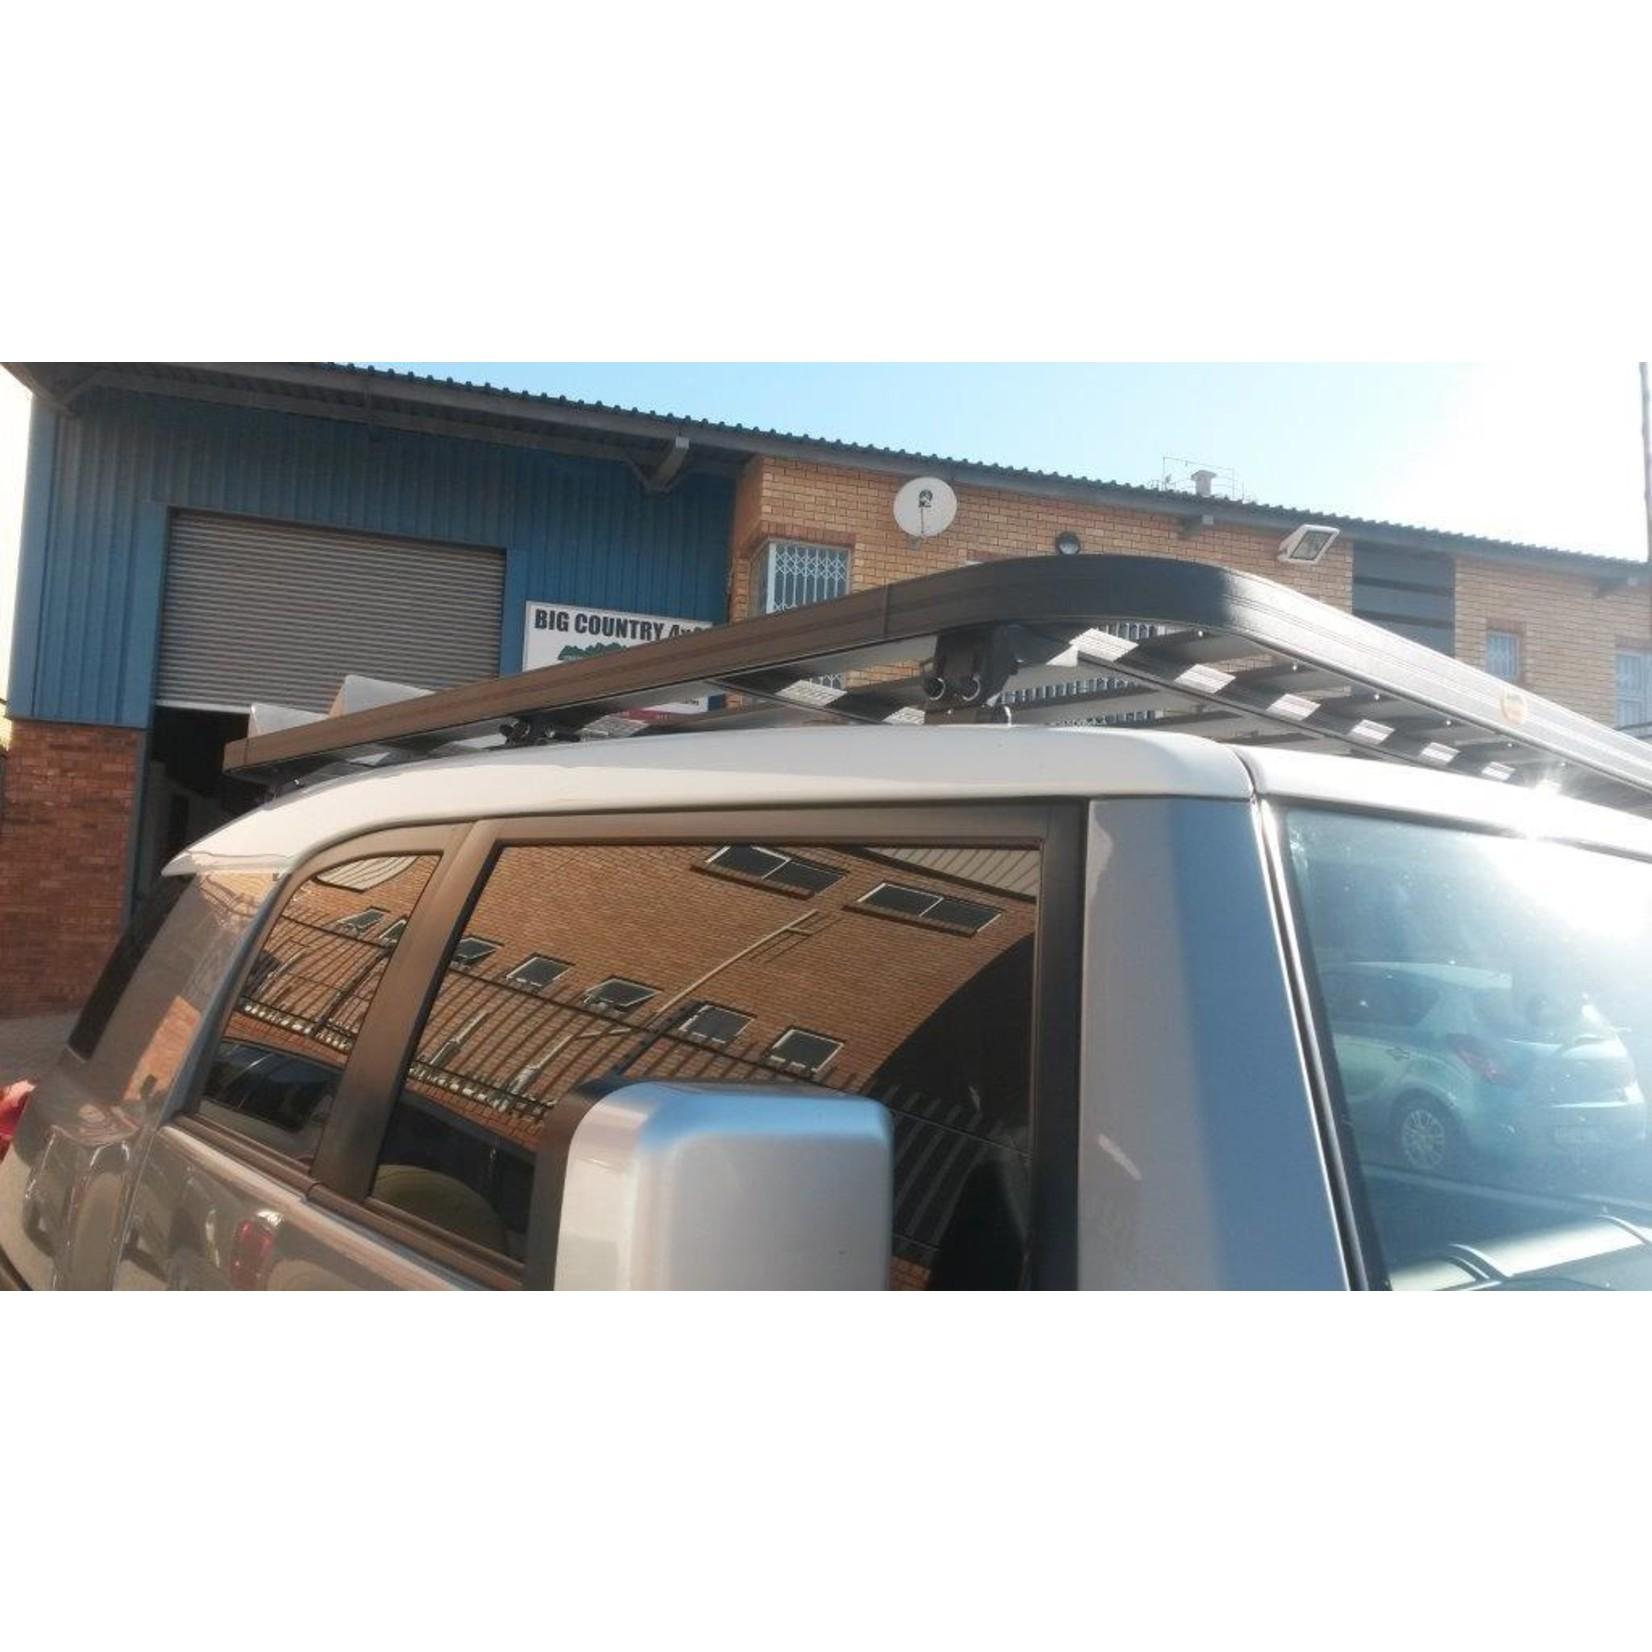 Big Country 4x4 Big Country 4x4 Toyota FJ Cruiser Roof Rack